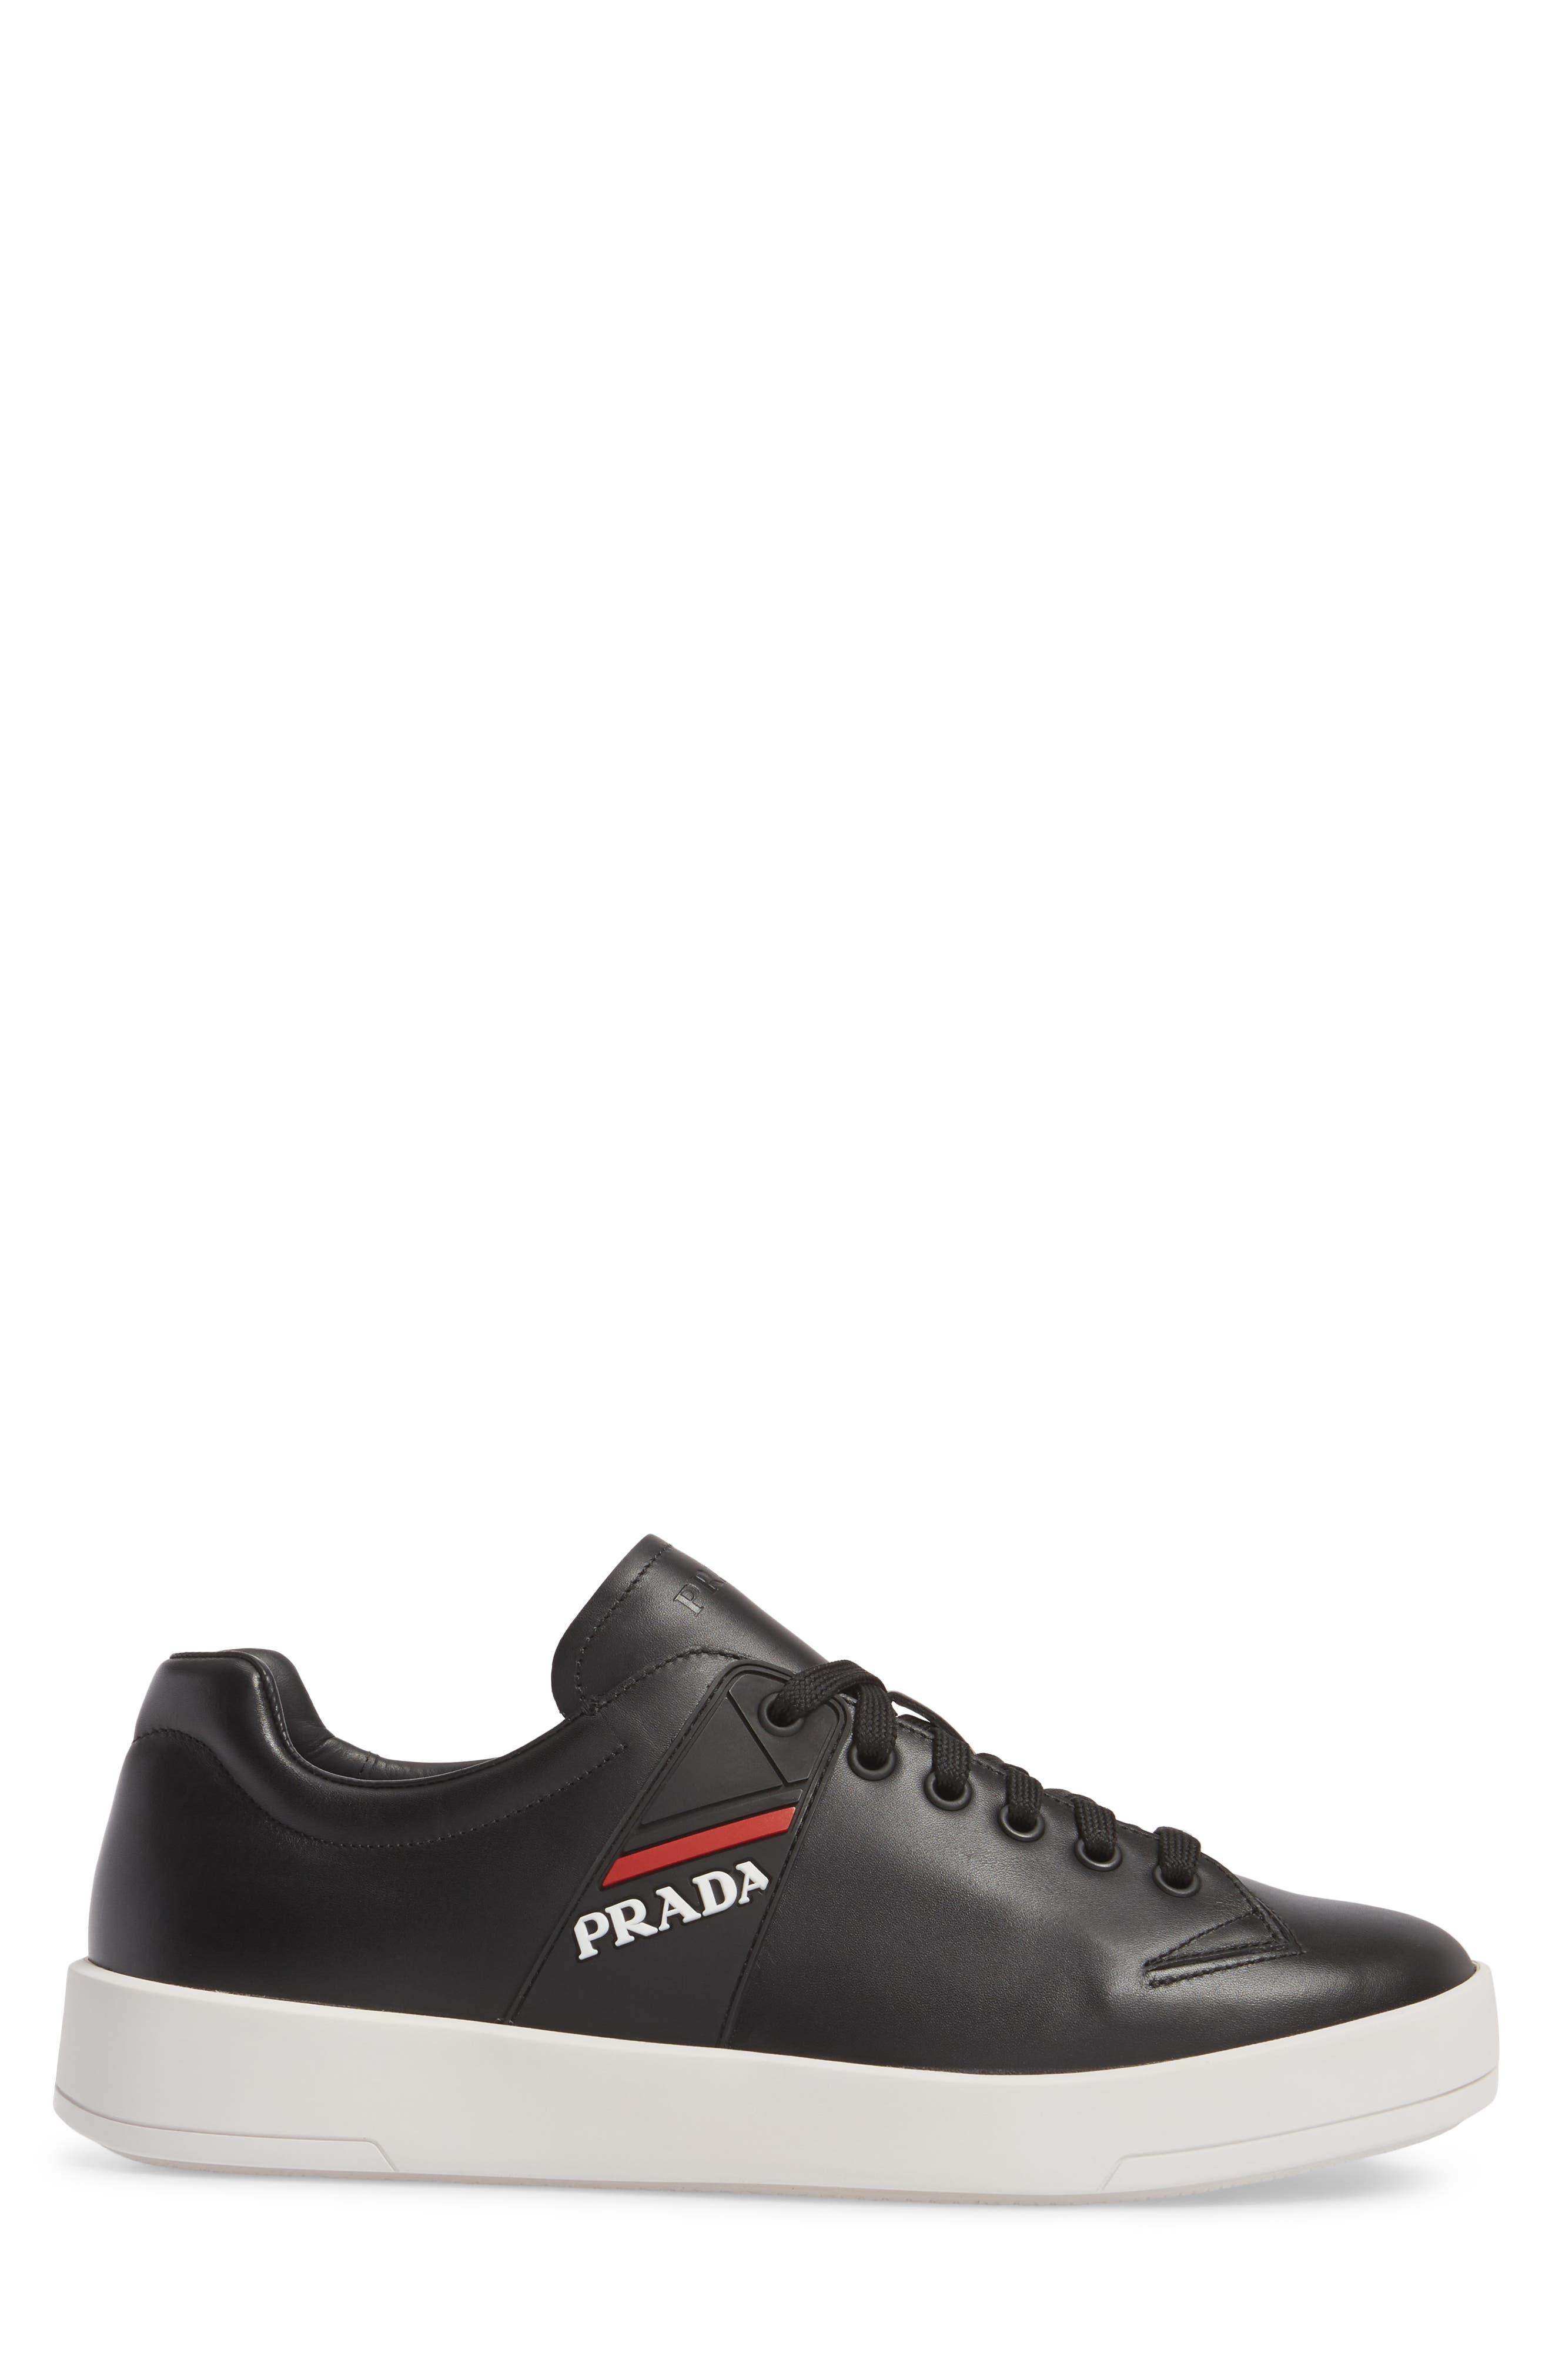 Linea Rossa Sneaker,                             Alternate thumbnail 3, color,                             Nero Bianco